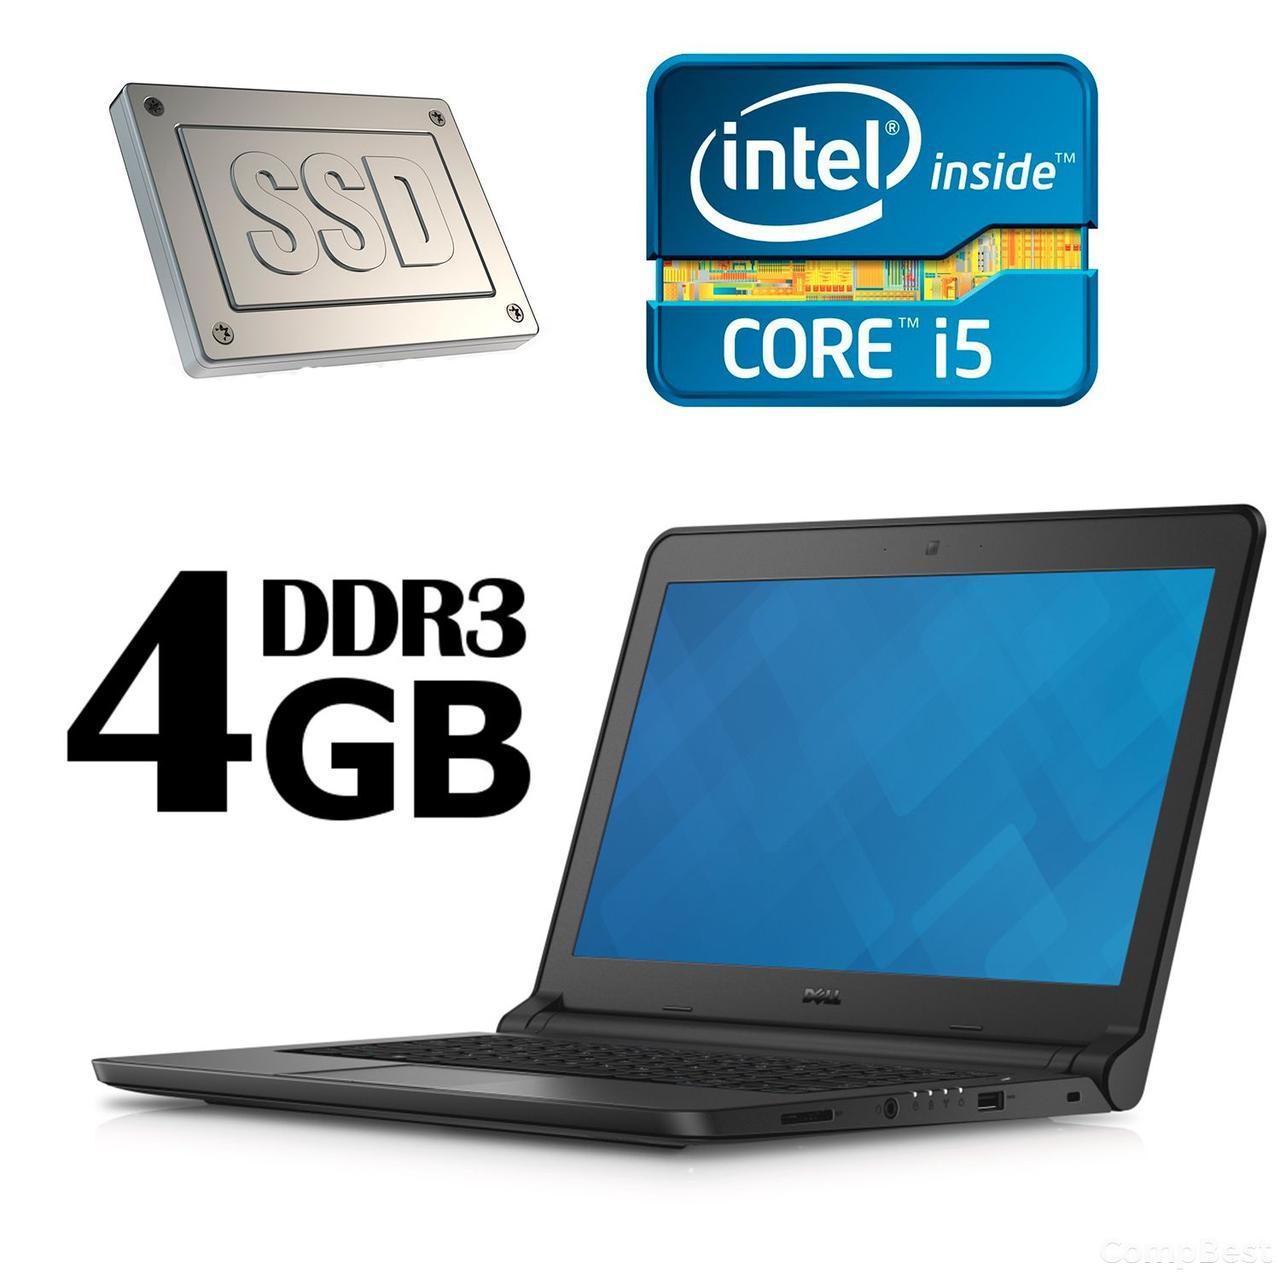 Dell Latitude 3340 / 13.3' / Intel Core i5-4200U ( 2(4) ядра по 1.6GHz ) / 4 GB DDR3 / 128 GB SSD / Intel HD 4400